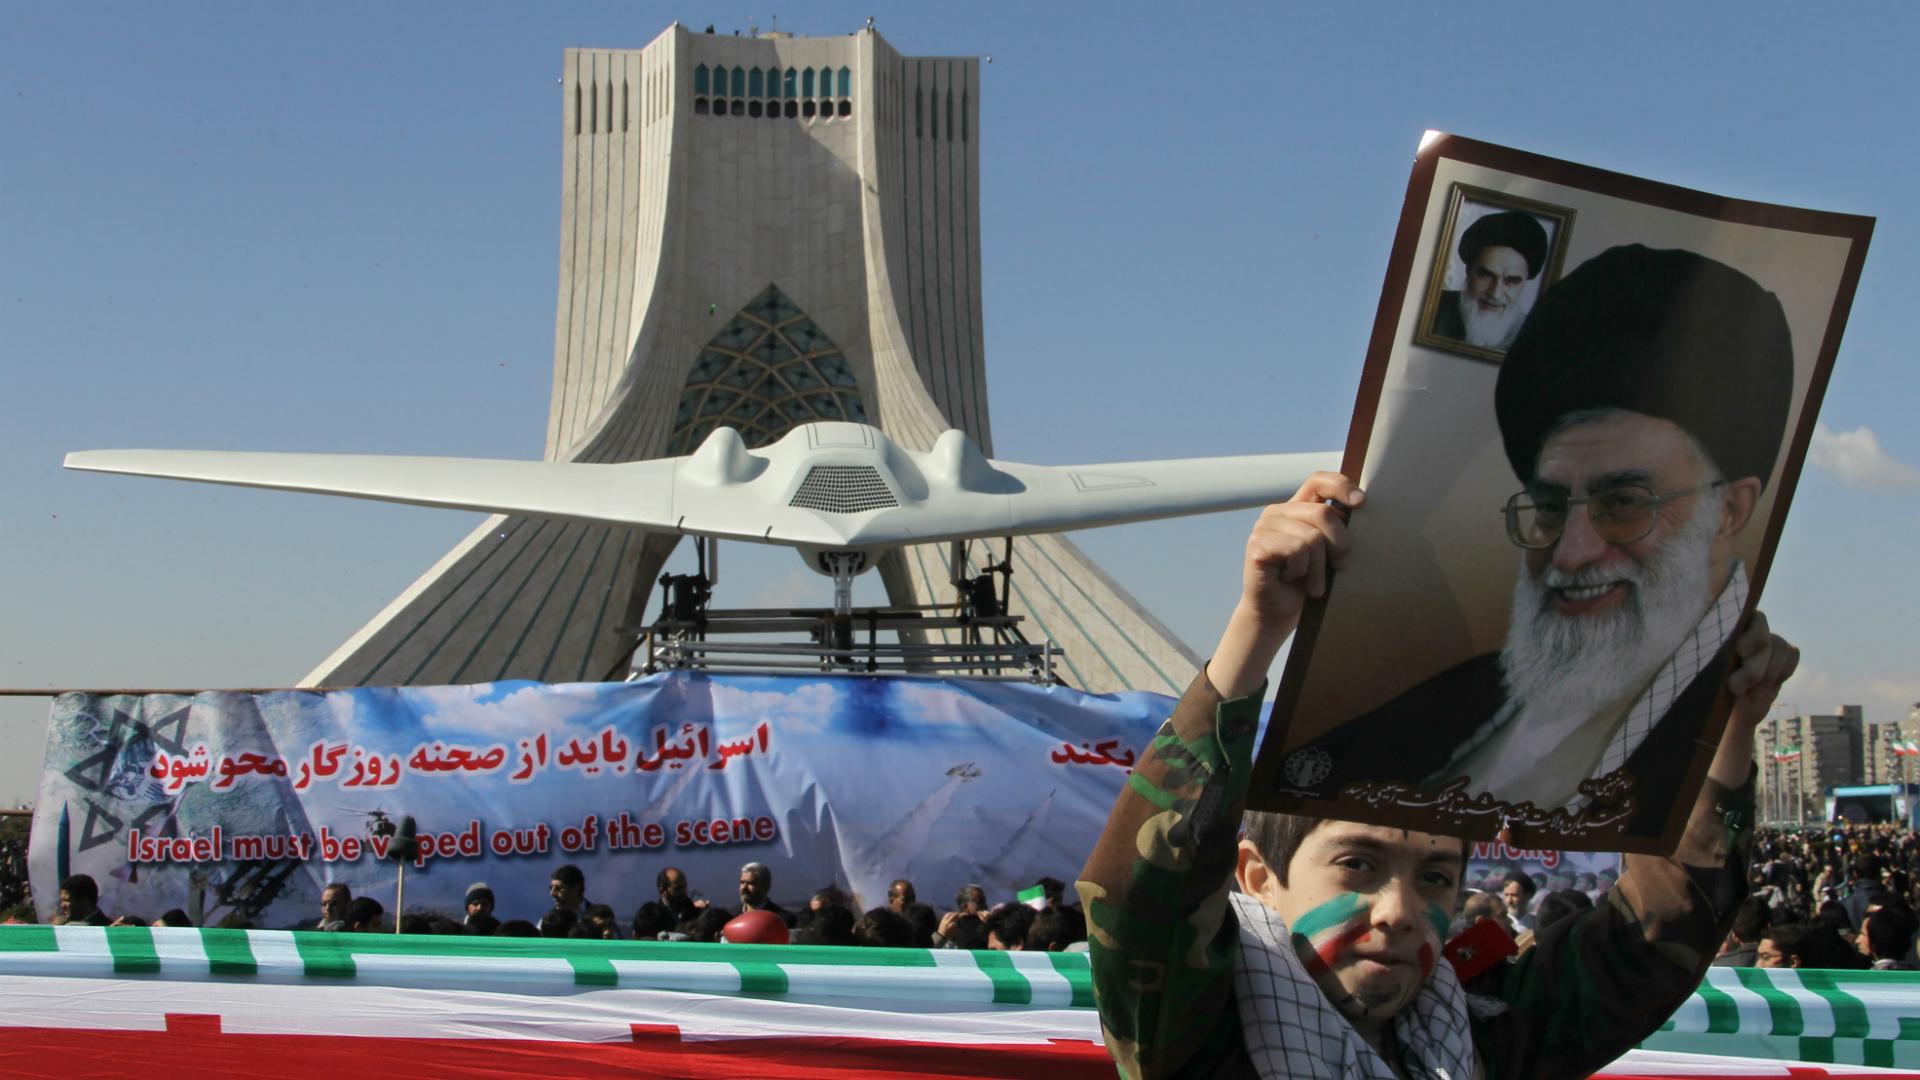 New Zealand headlines mislead on Iranian provocation